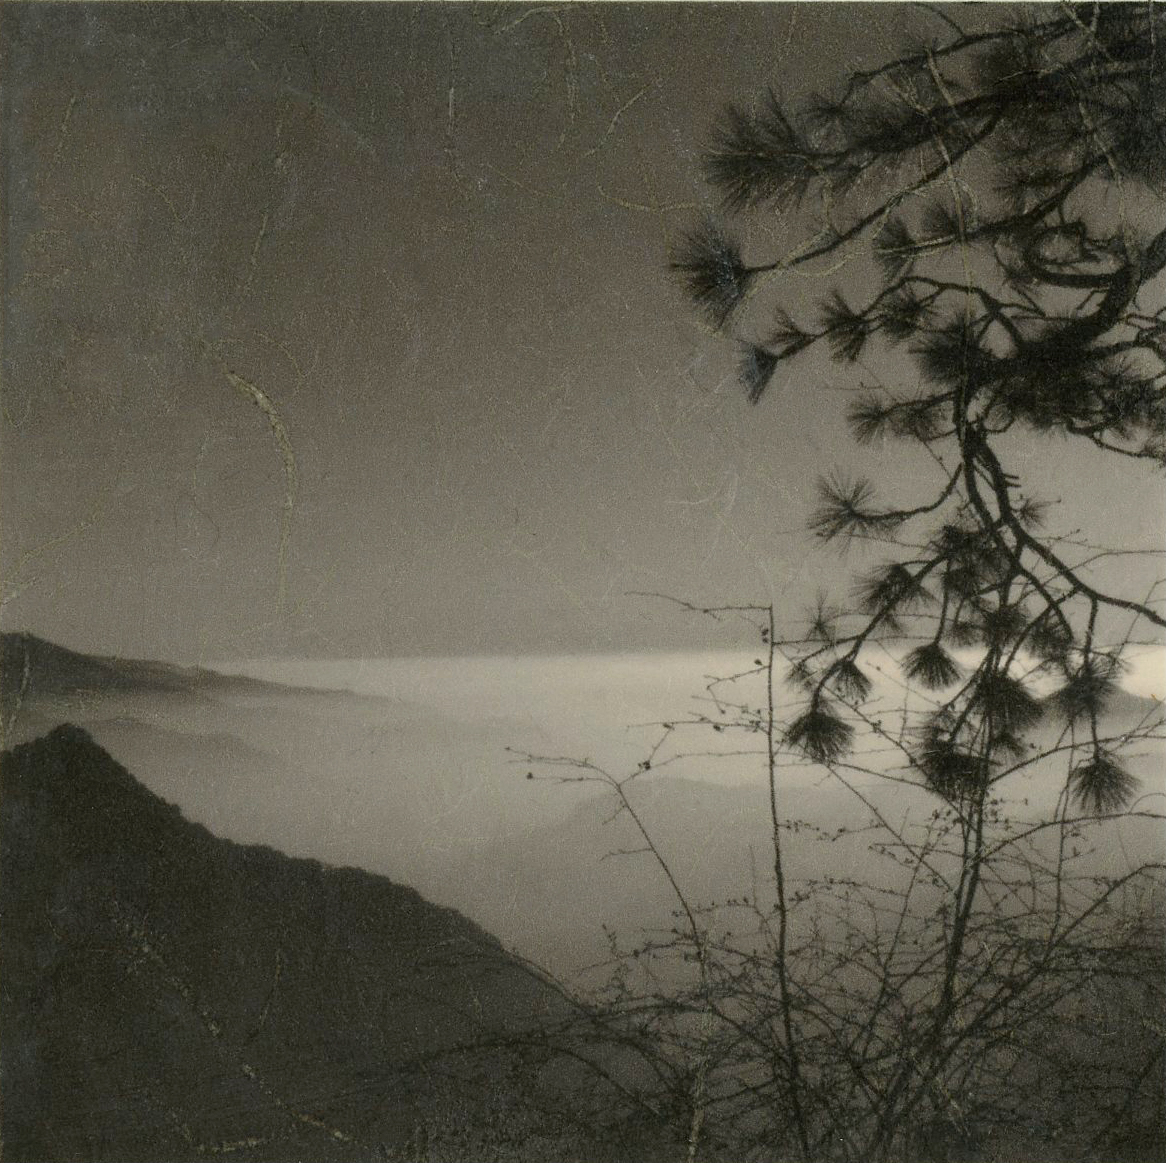 Oboro (Obscure mist)